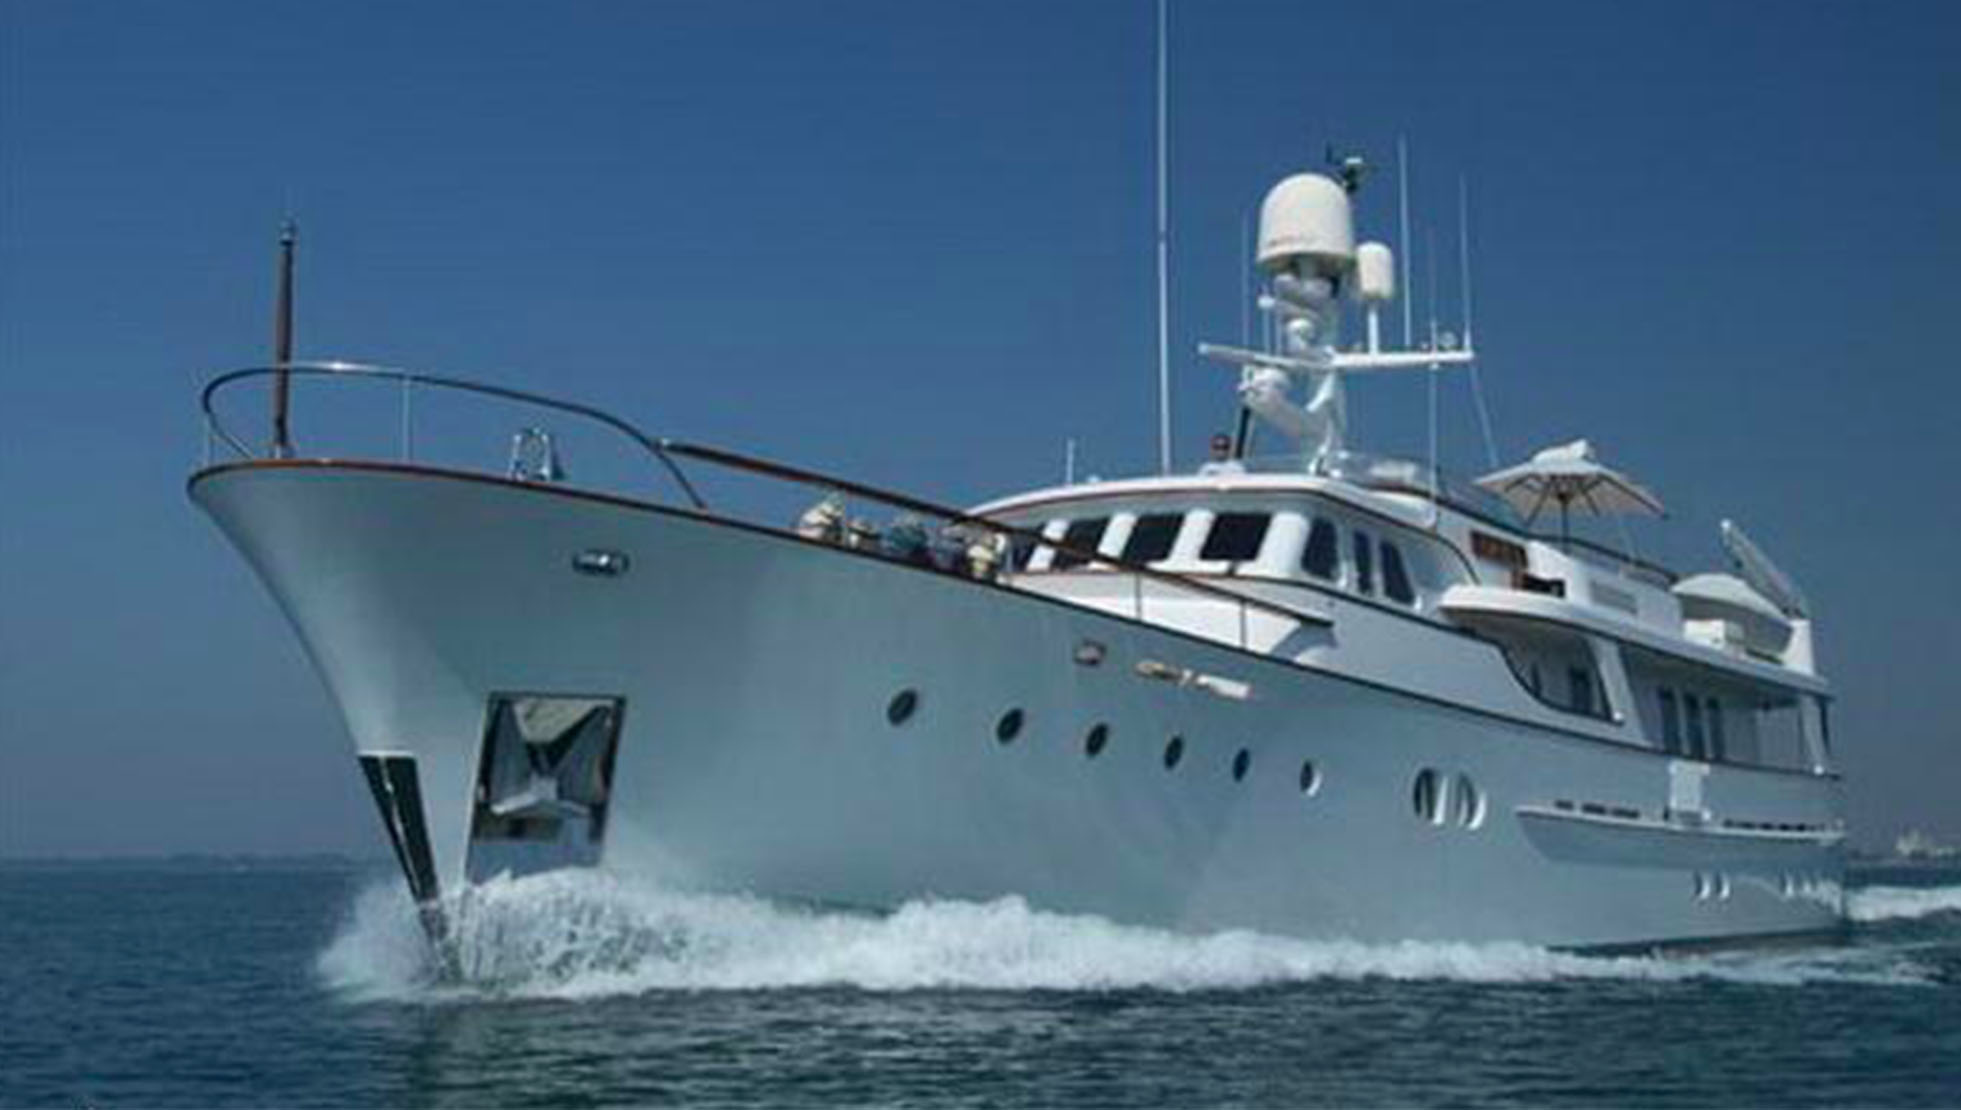 Evnike Yacht for sale 2